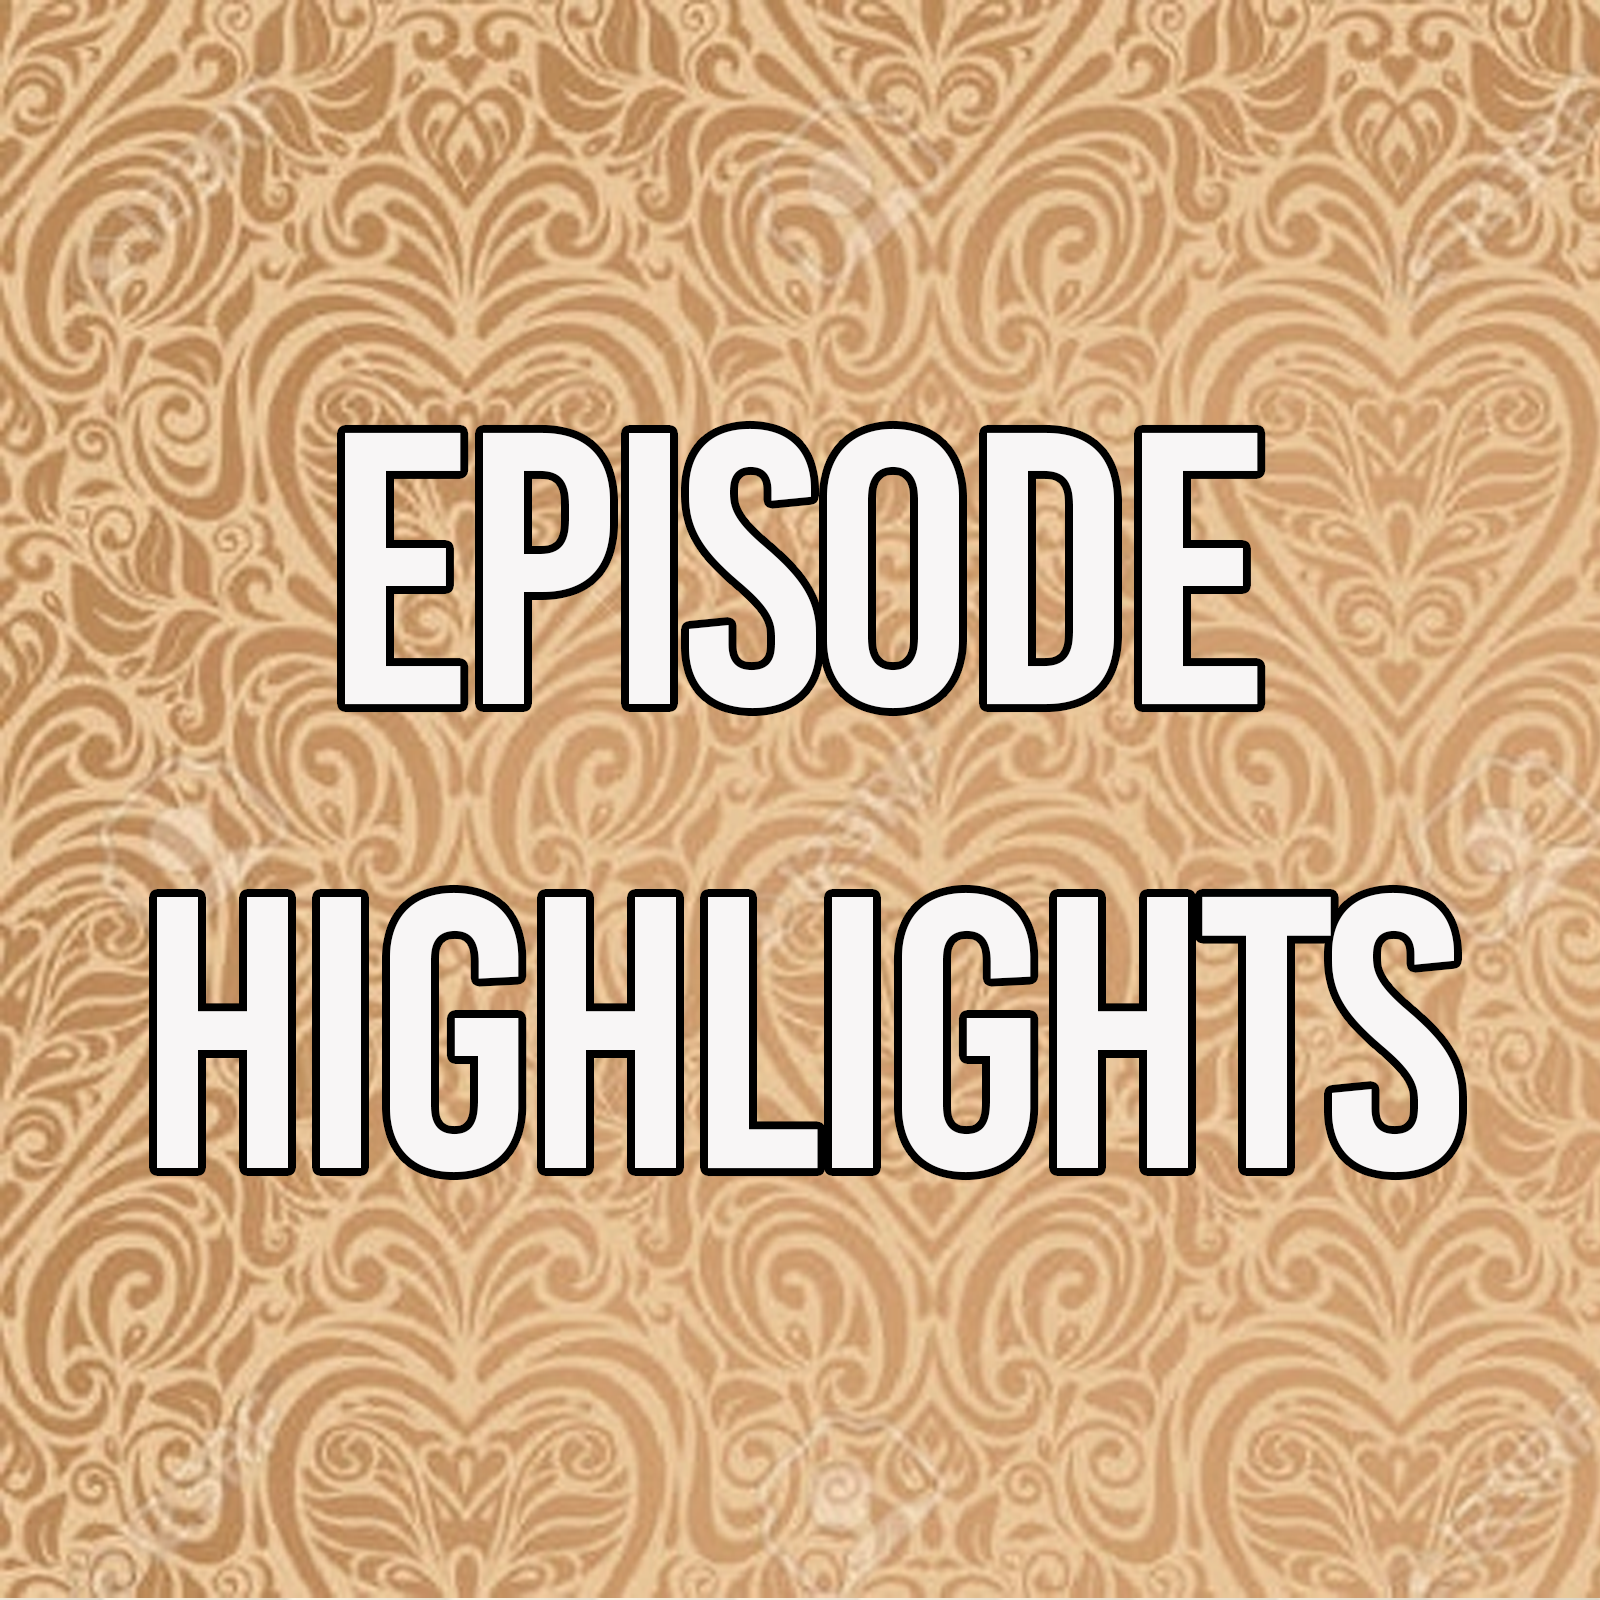 episode highlights.png